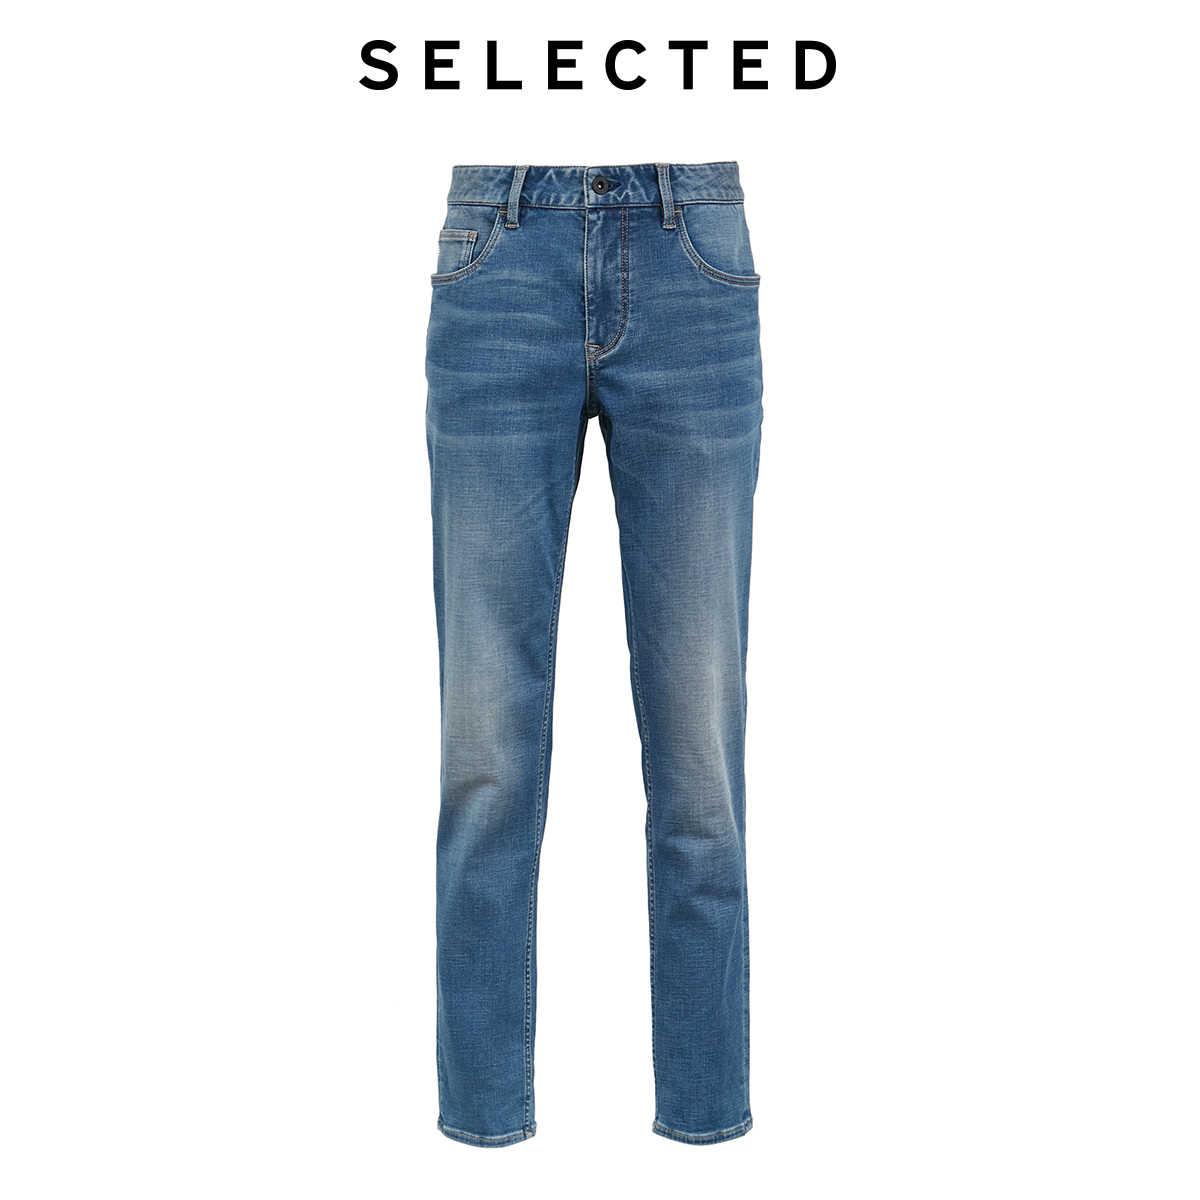 SELECTED 남성용 겨울 슬림 피트 스트레치 페이딩 Distressing Jeans L | 419432527